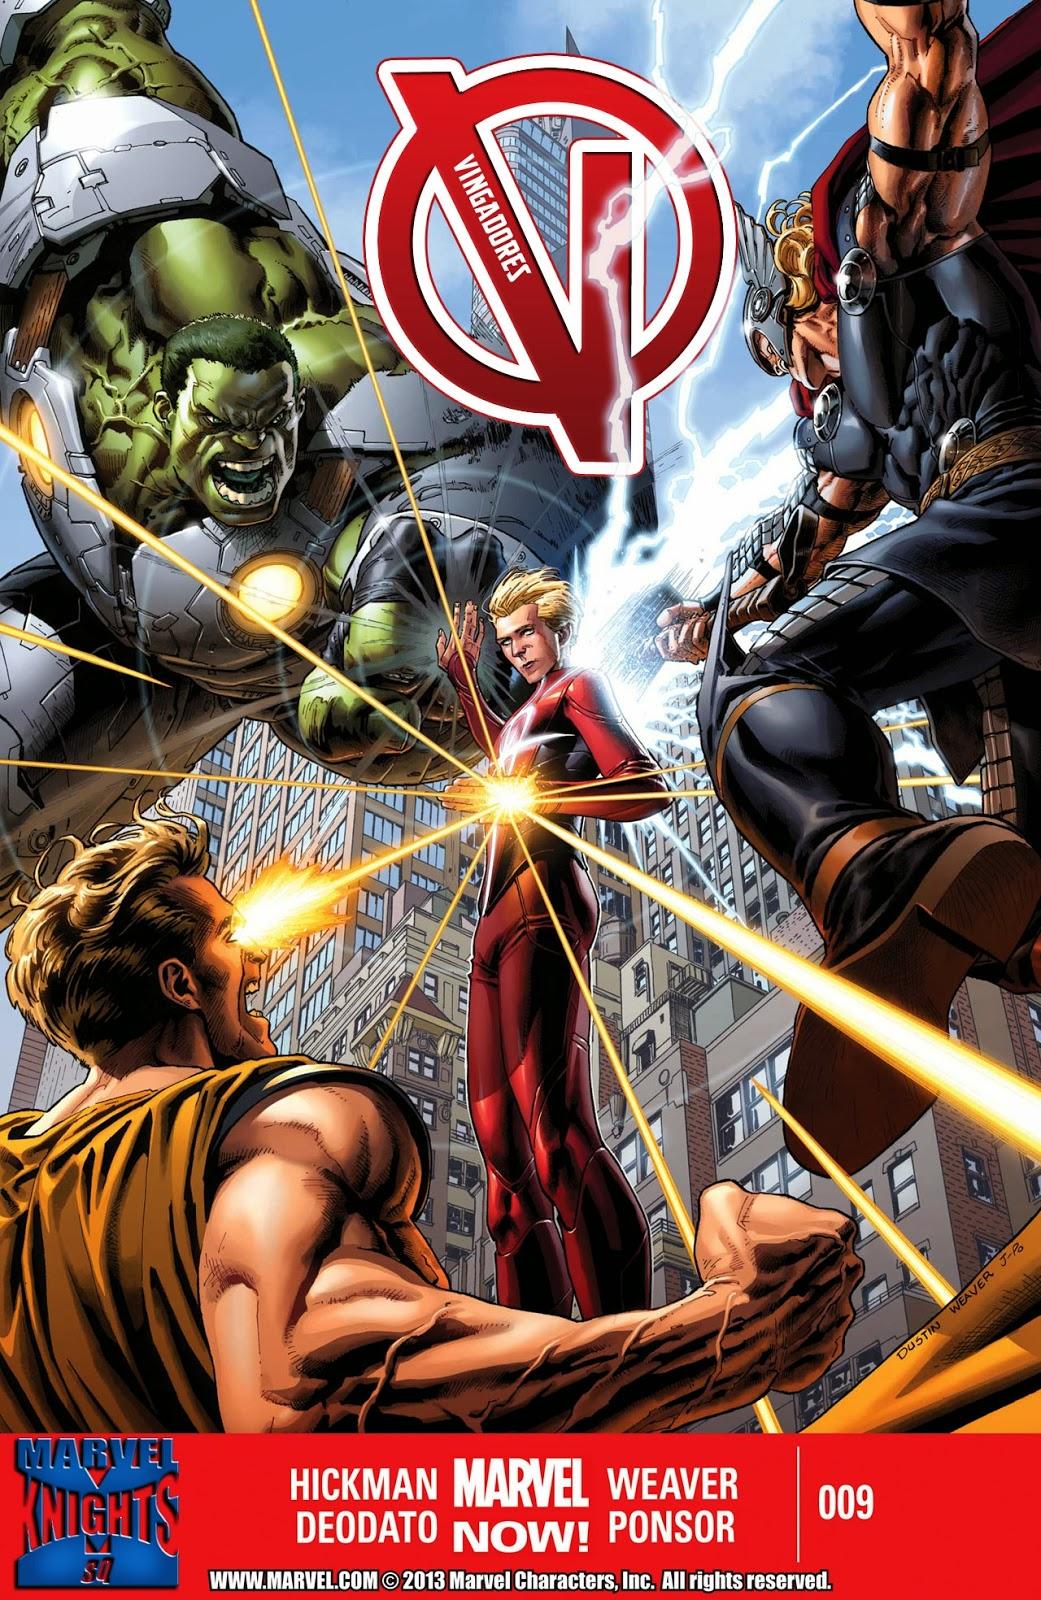 Nova Marvel! Vingadores #9